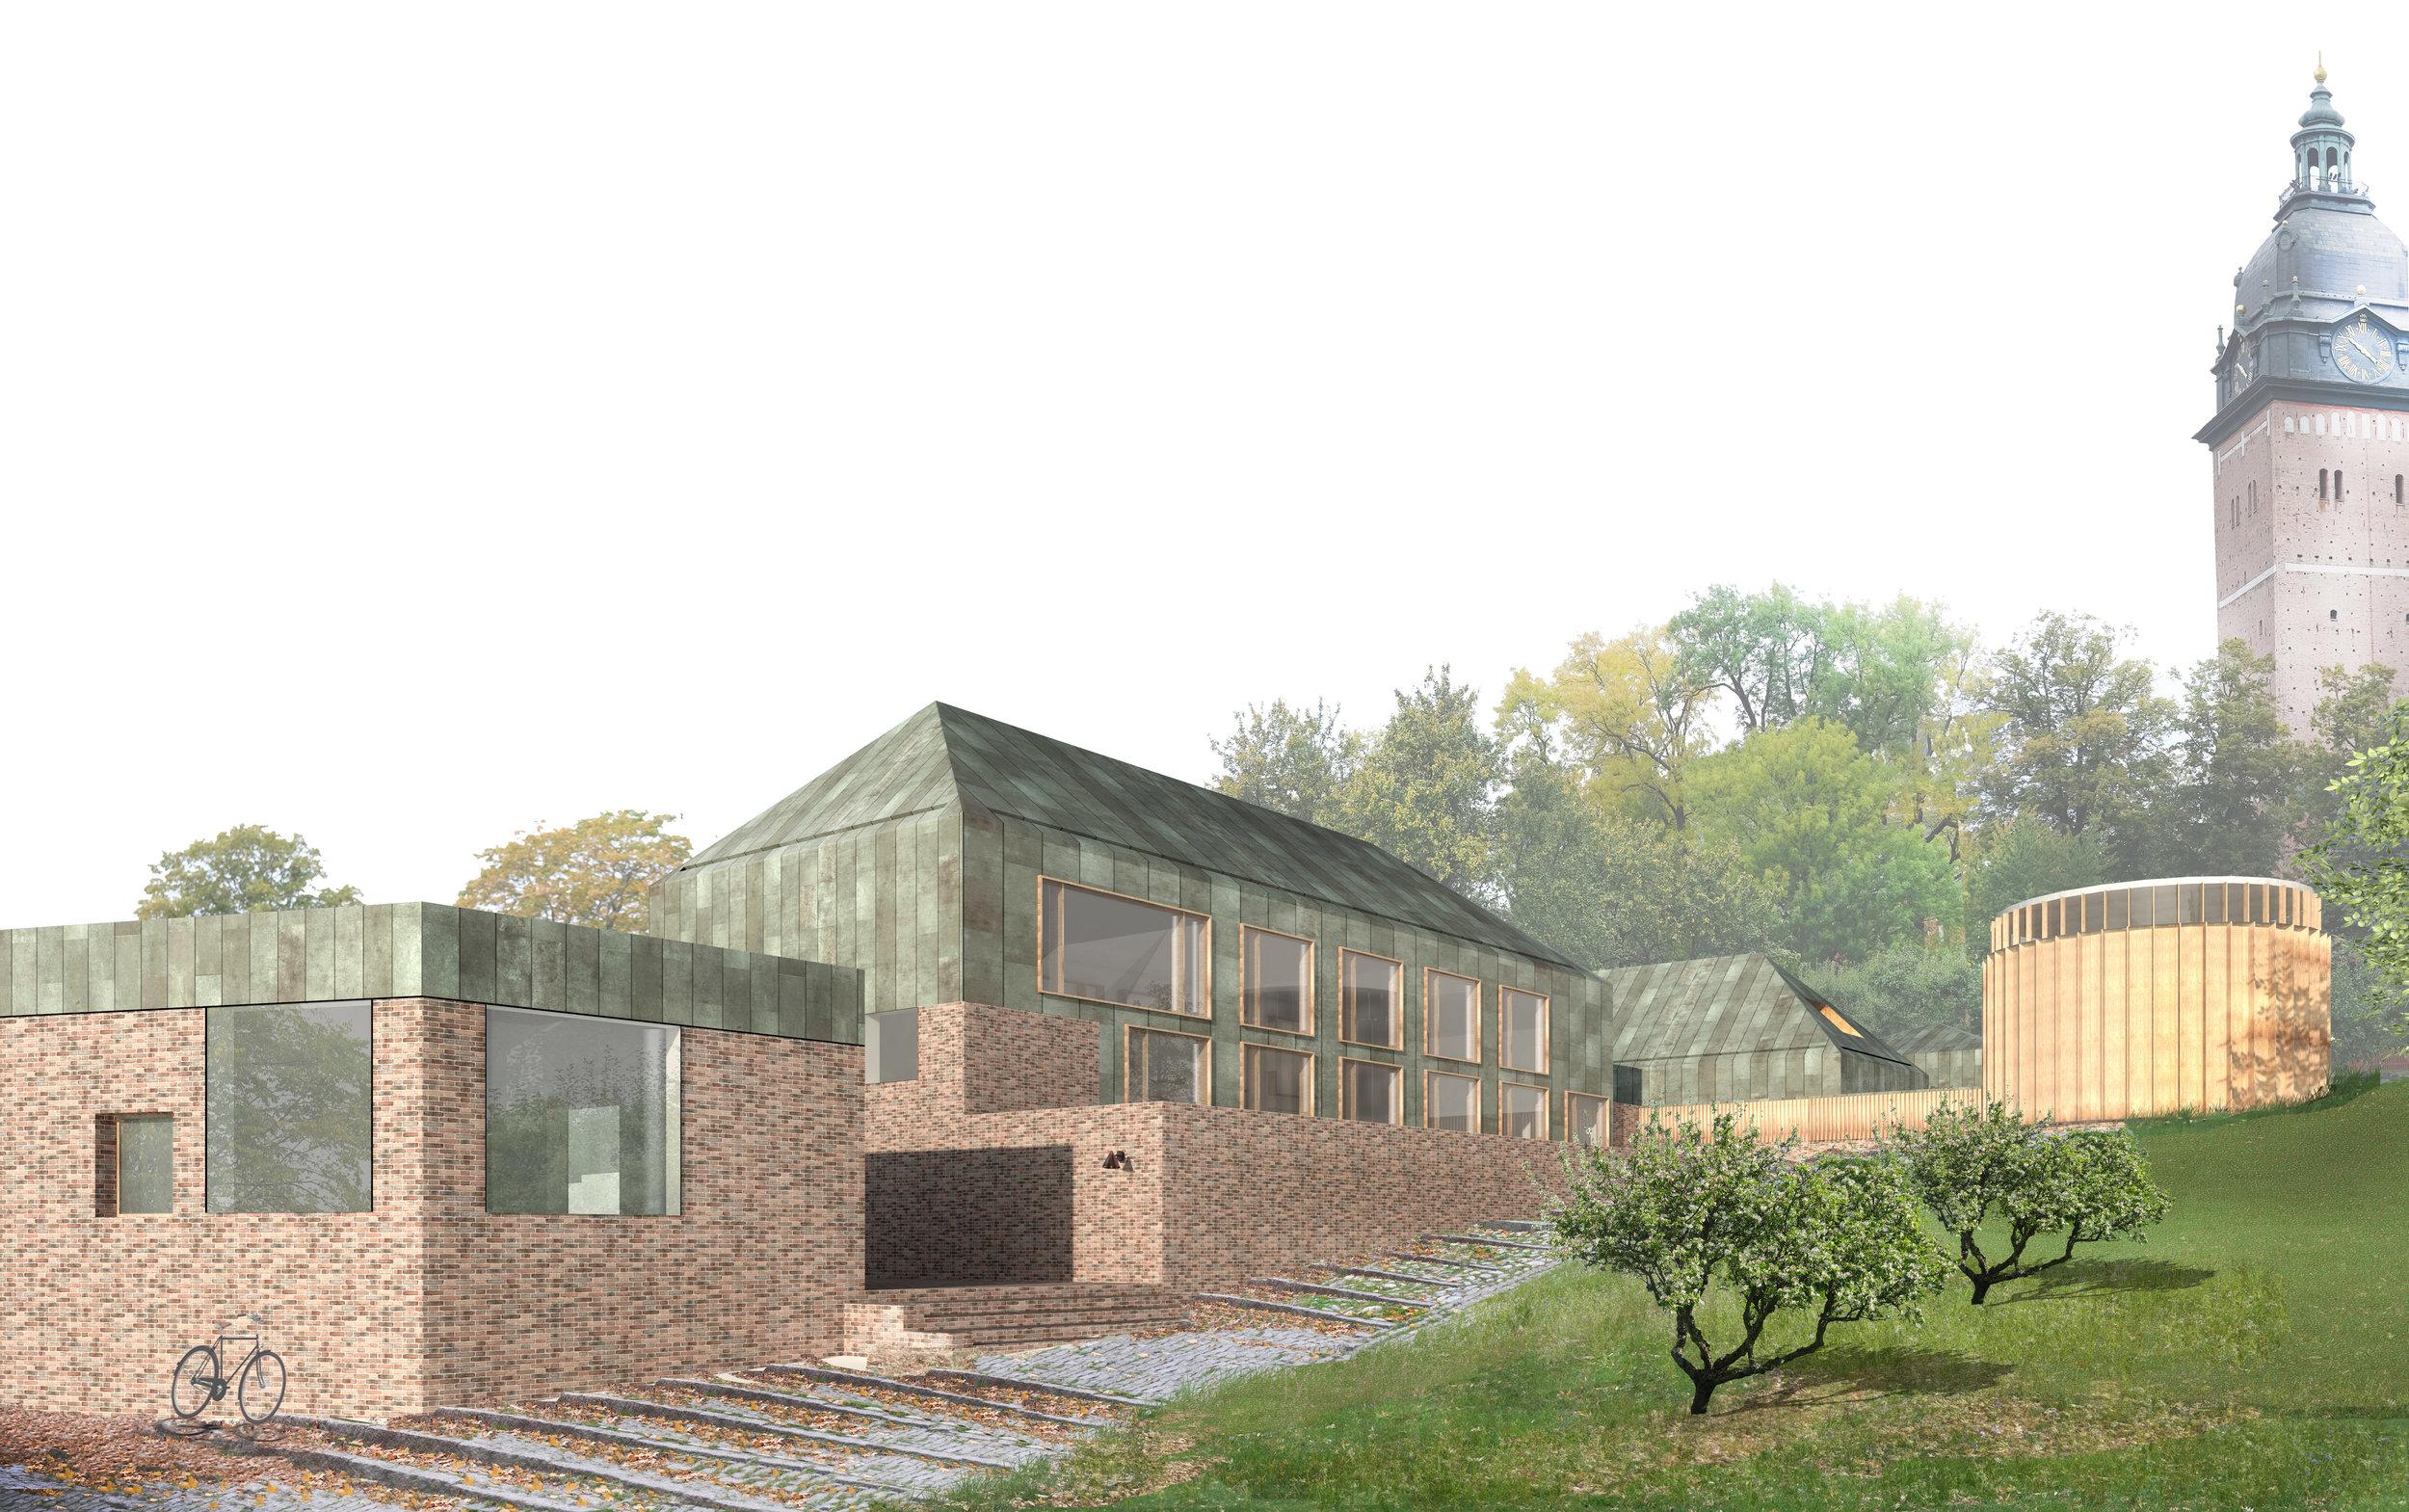 exterior_01_strangnas_daniel_lindberg_arkitektur.JPG